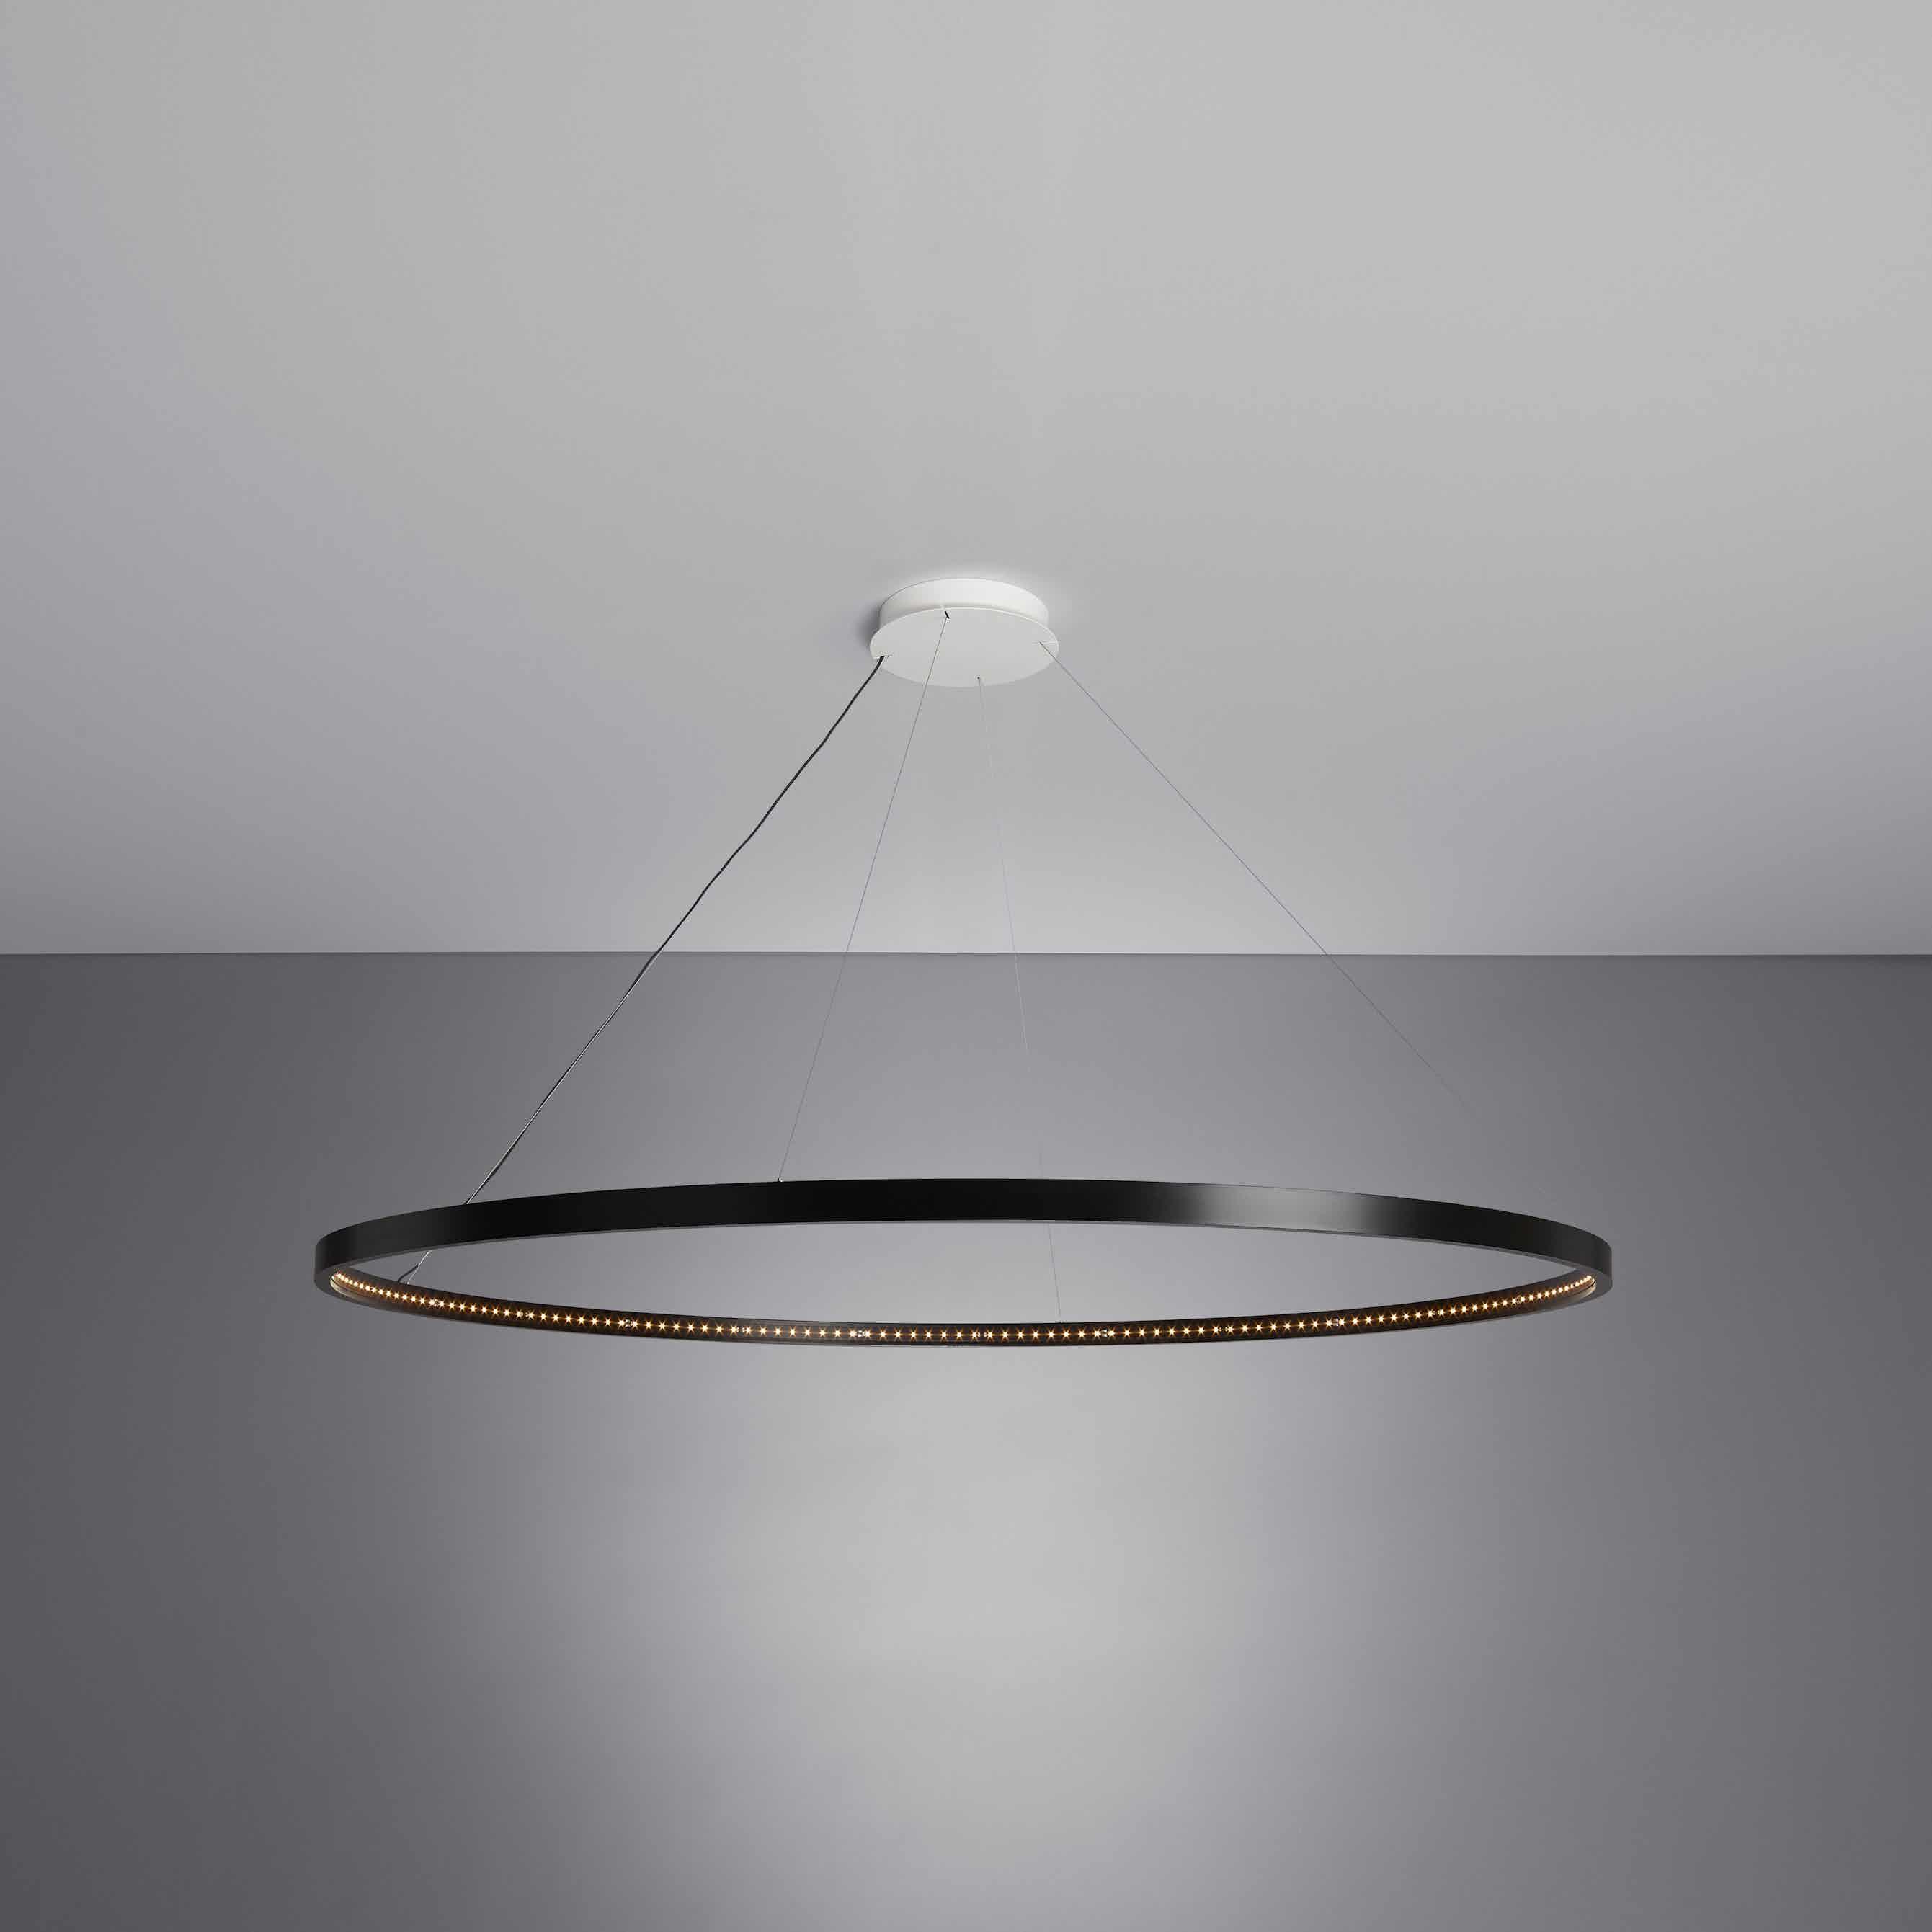 Le-deun-luminaires-omega-hanging-lamp-black-ceiling-haute-living